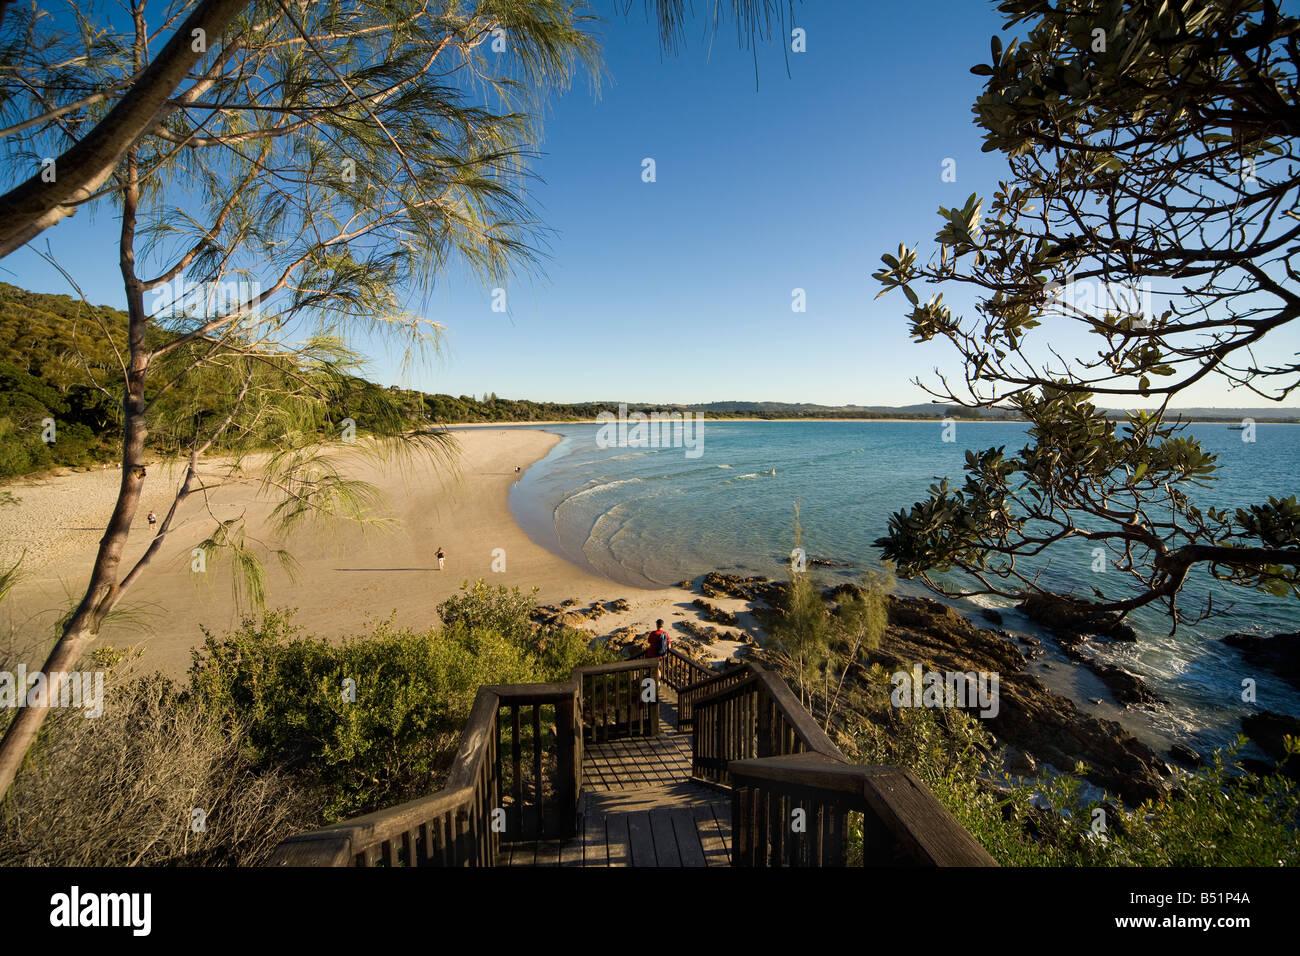 https://c7.alamy.com/comp/B51P4A/byron-bay-beach-view-from-the-pass-clarkes-beach-byron-bay-nsw-australia-B51P4A.jpg